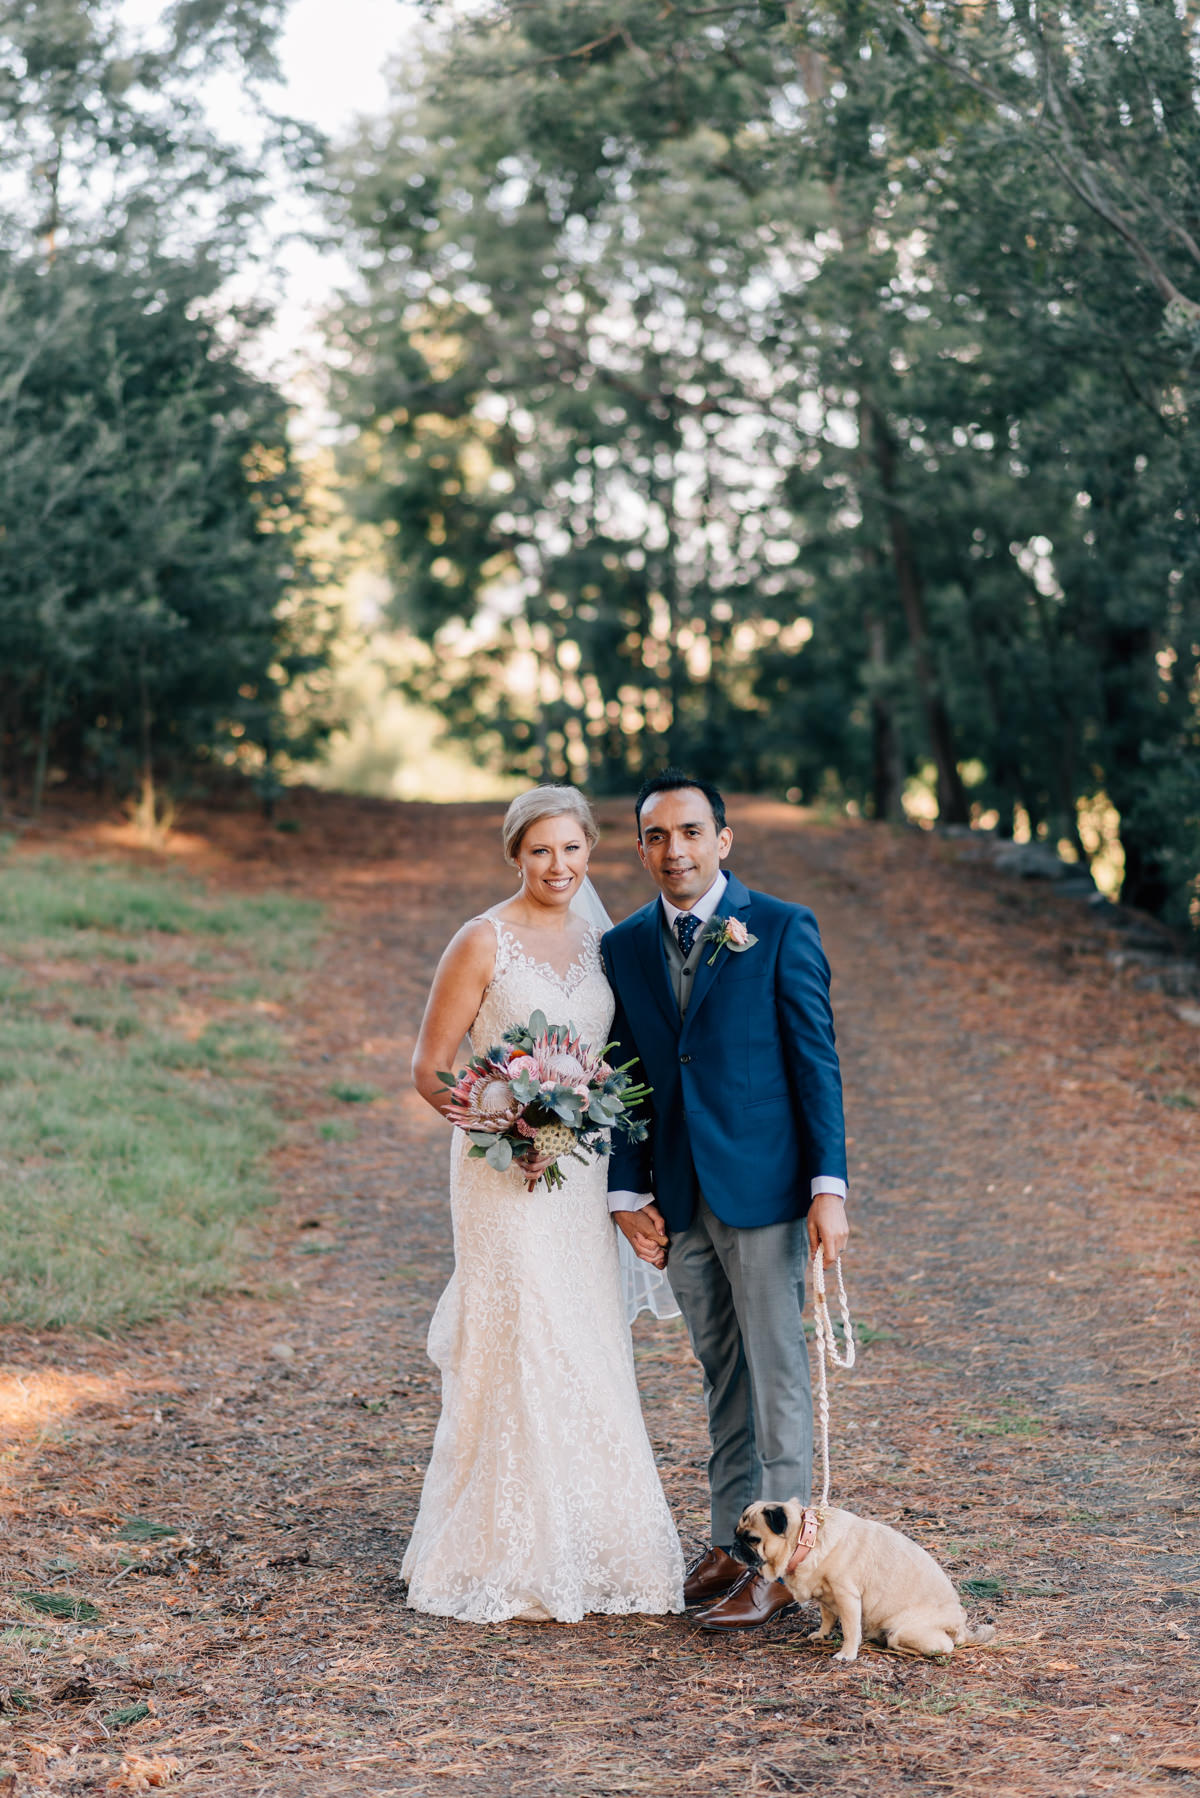 Wedding-Photohraphy-Tasmania-Josef-Chromy-53.jpg